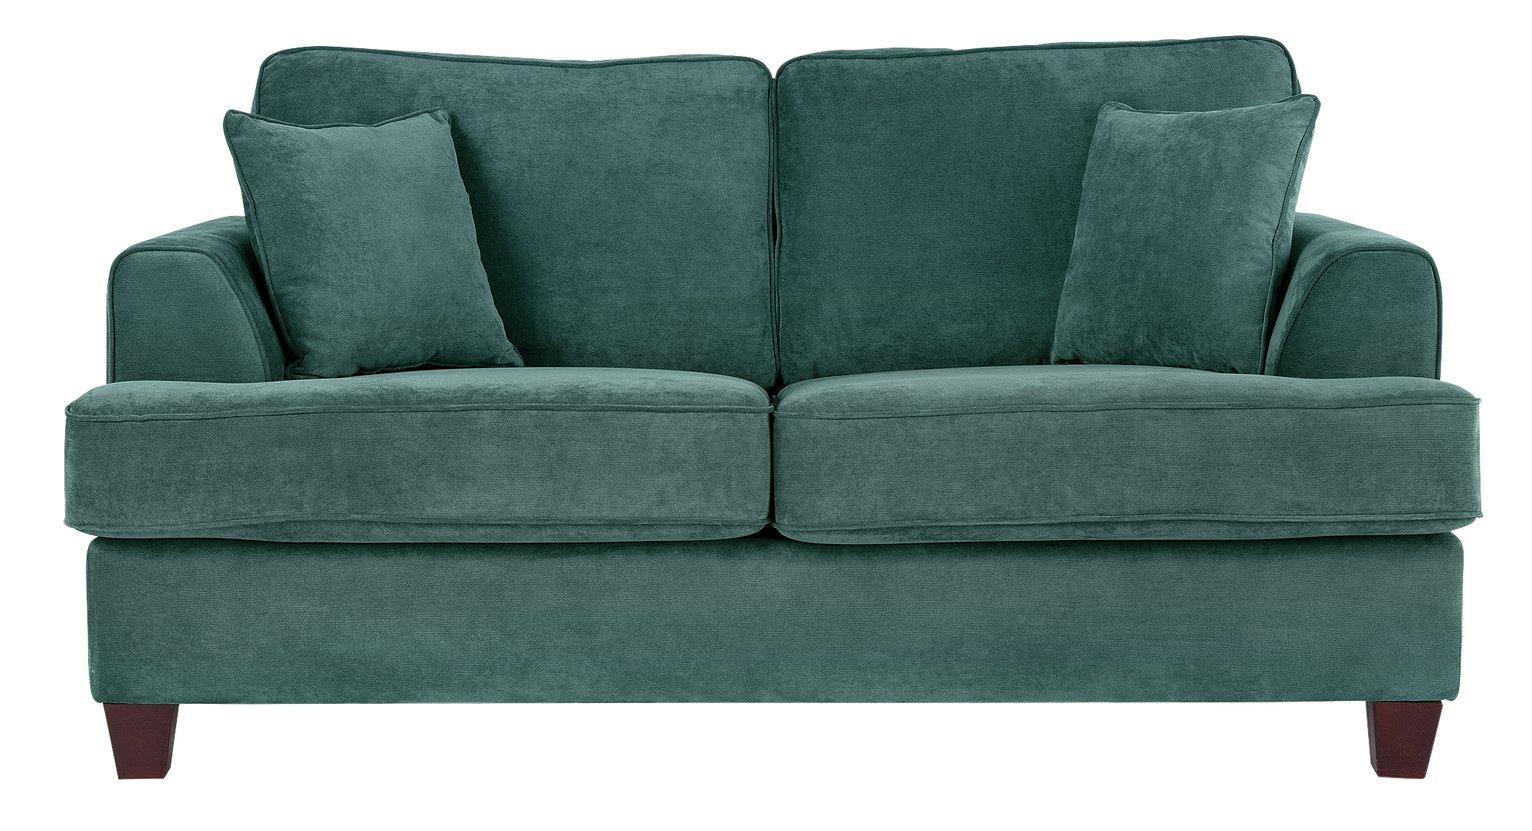 Argos Home Hampstead 2 Seater Fabric Sofa Bed - Ocean Blue